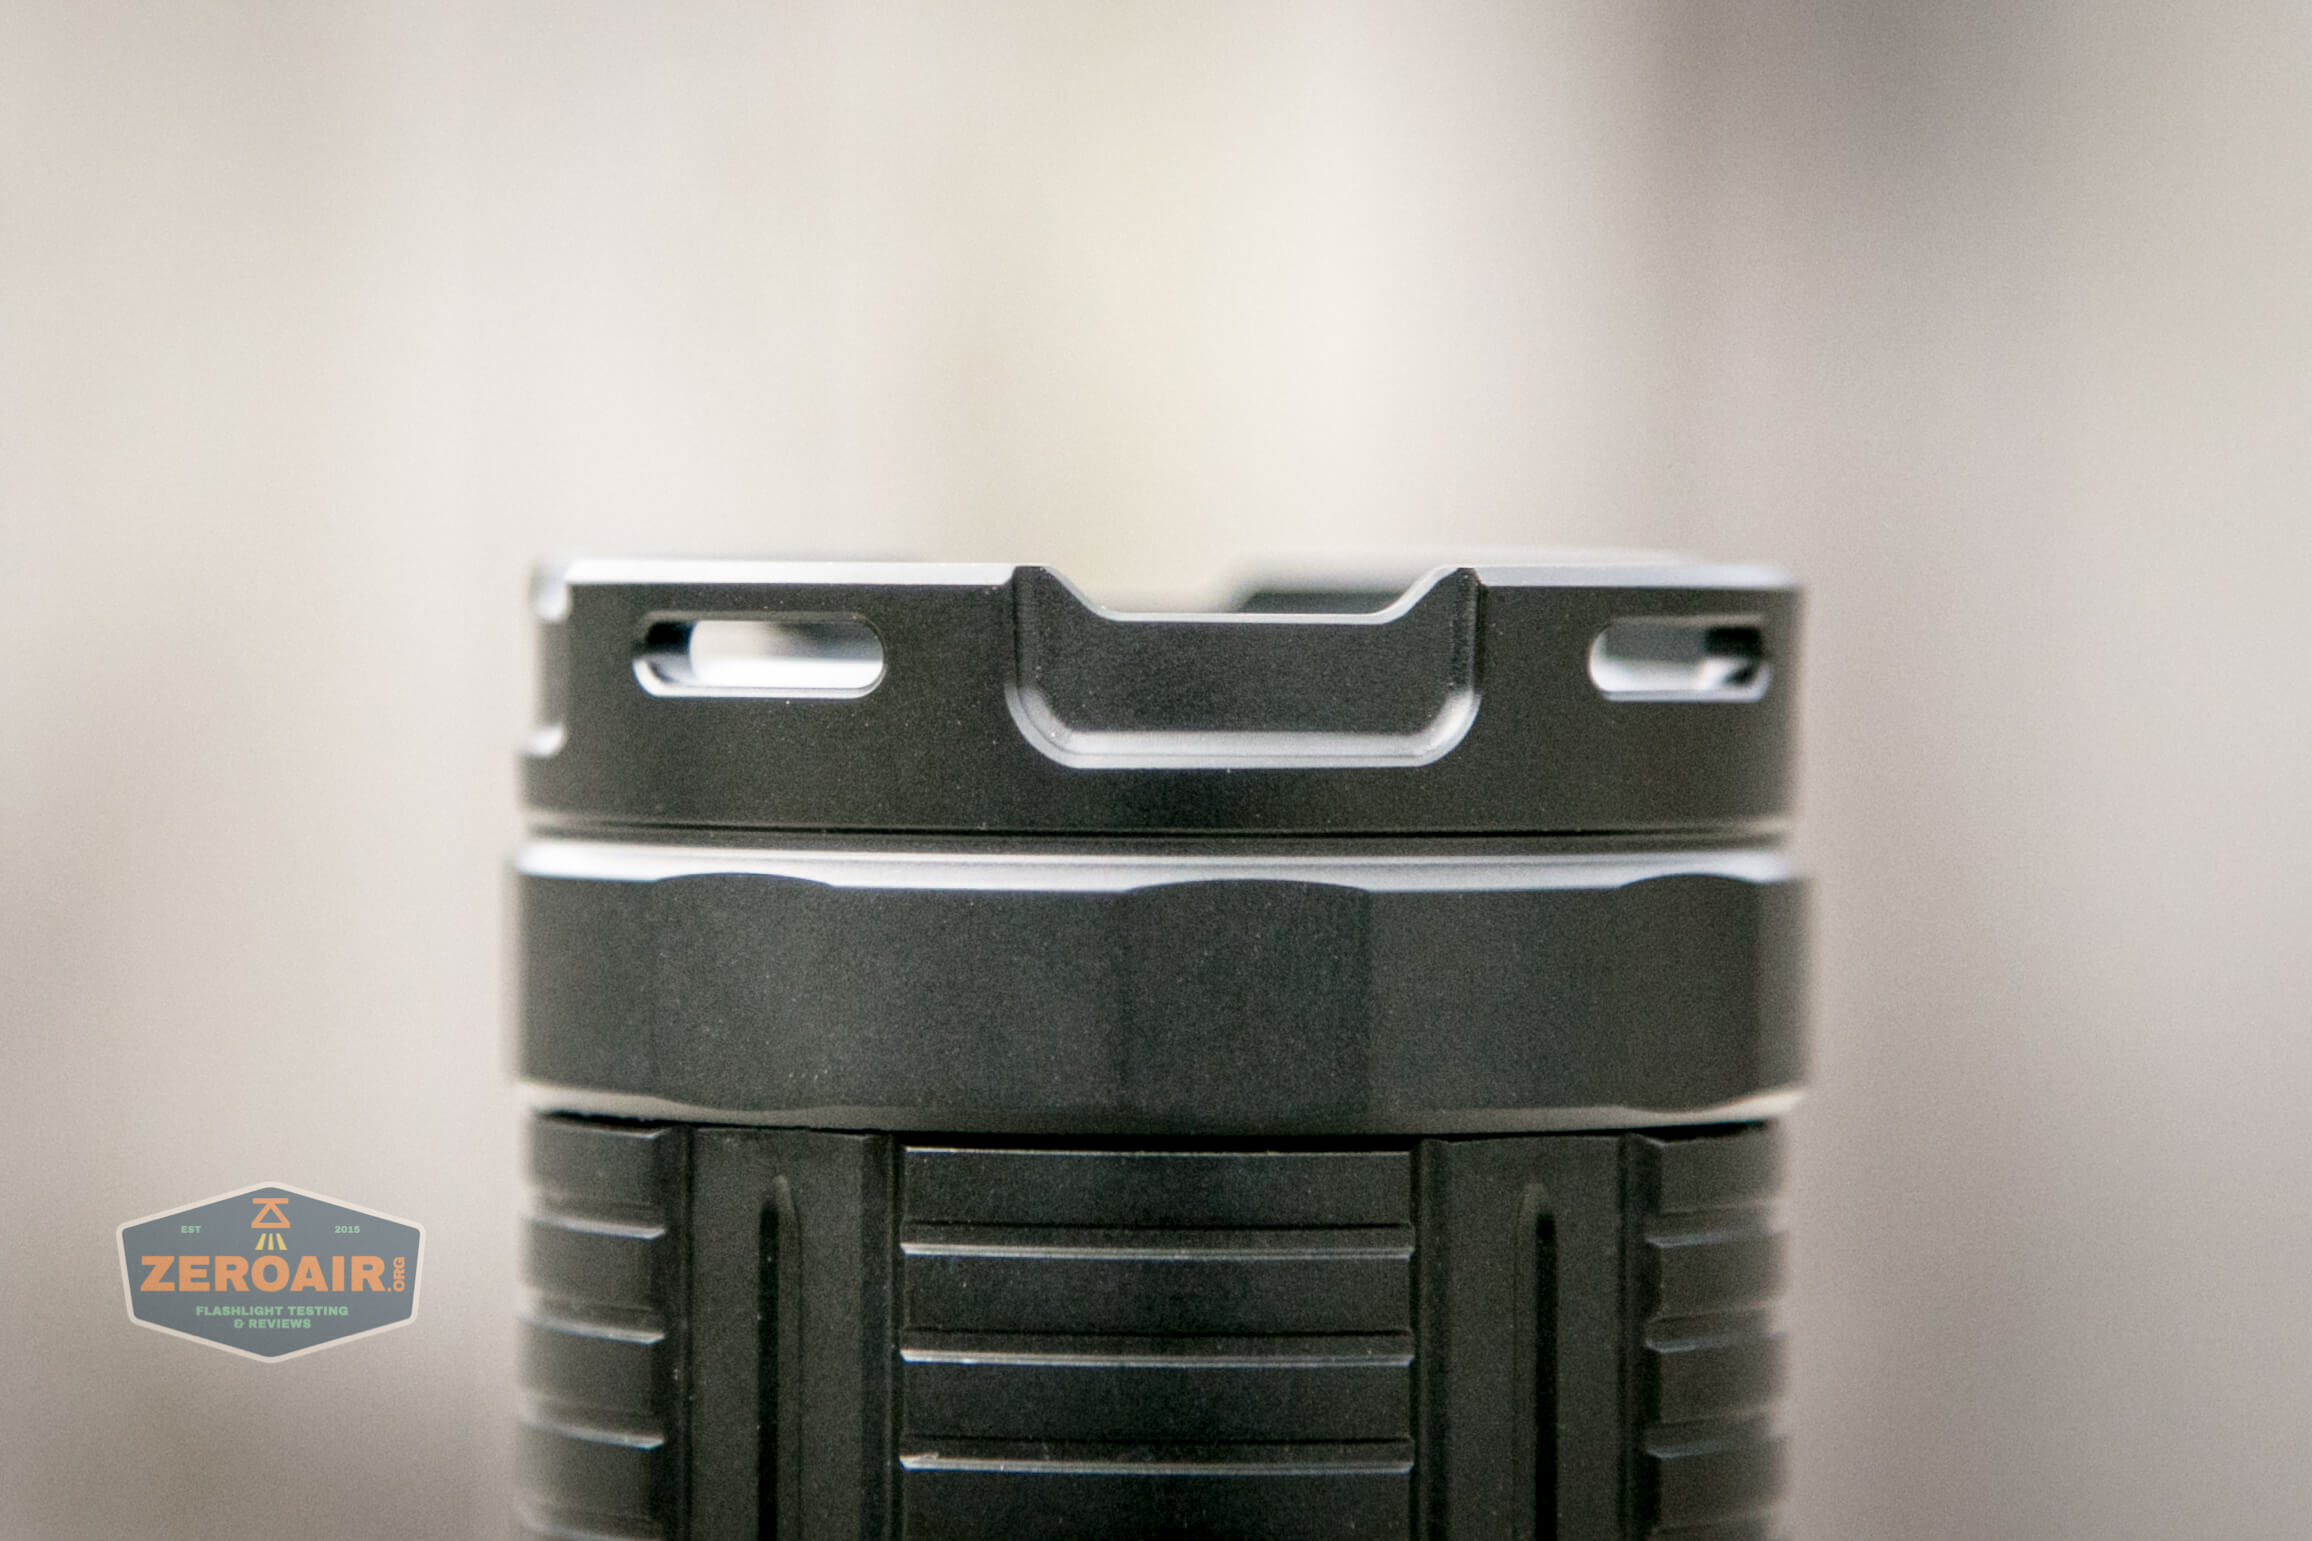 fenix lr40r tailcap lanyard holes